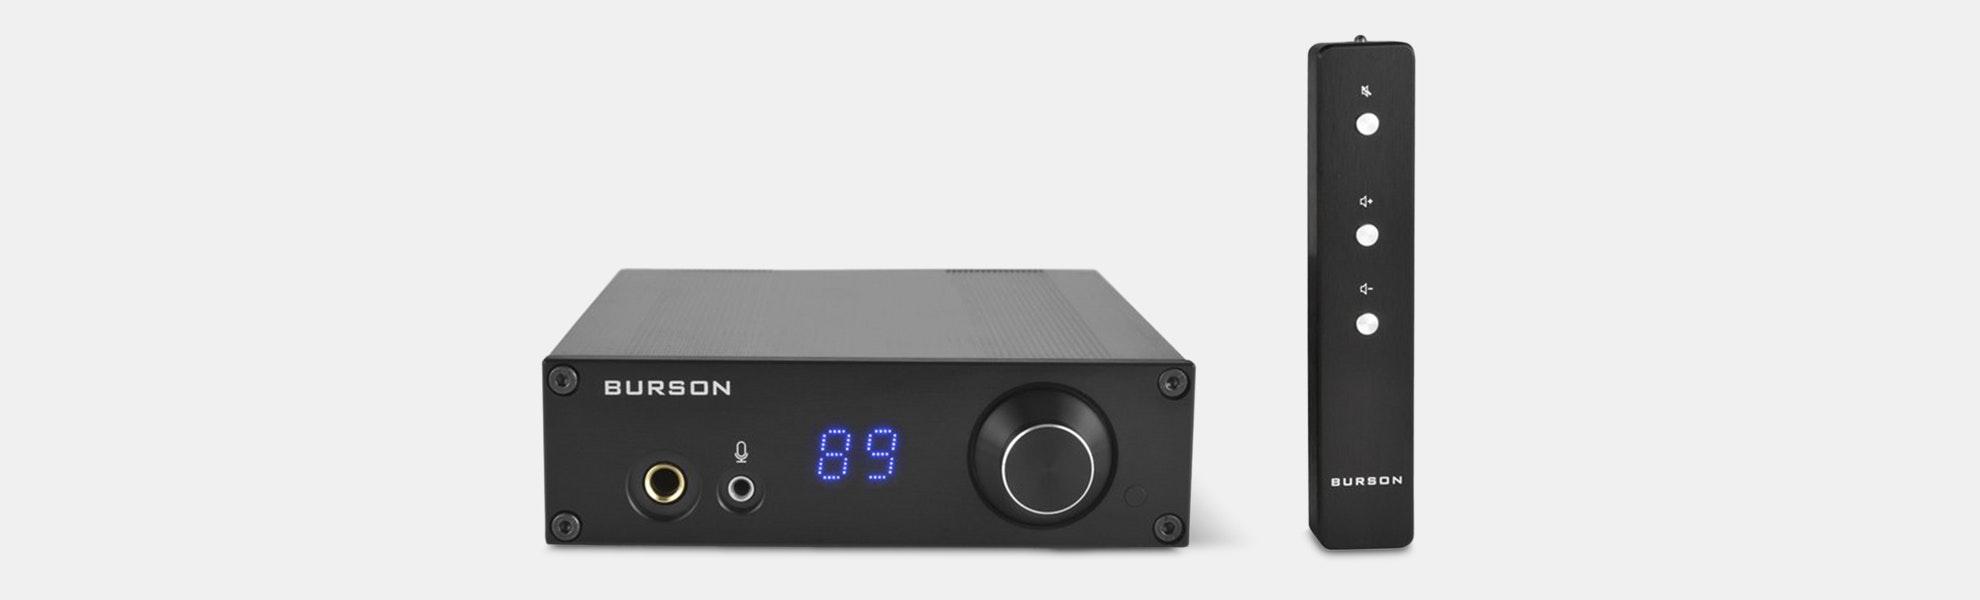 Burson Play DAC/Amp - Massdrop Exclusive